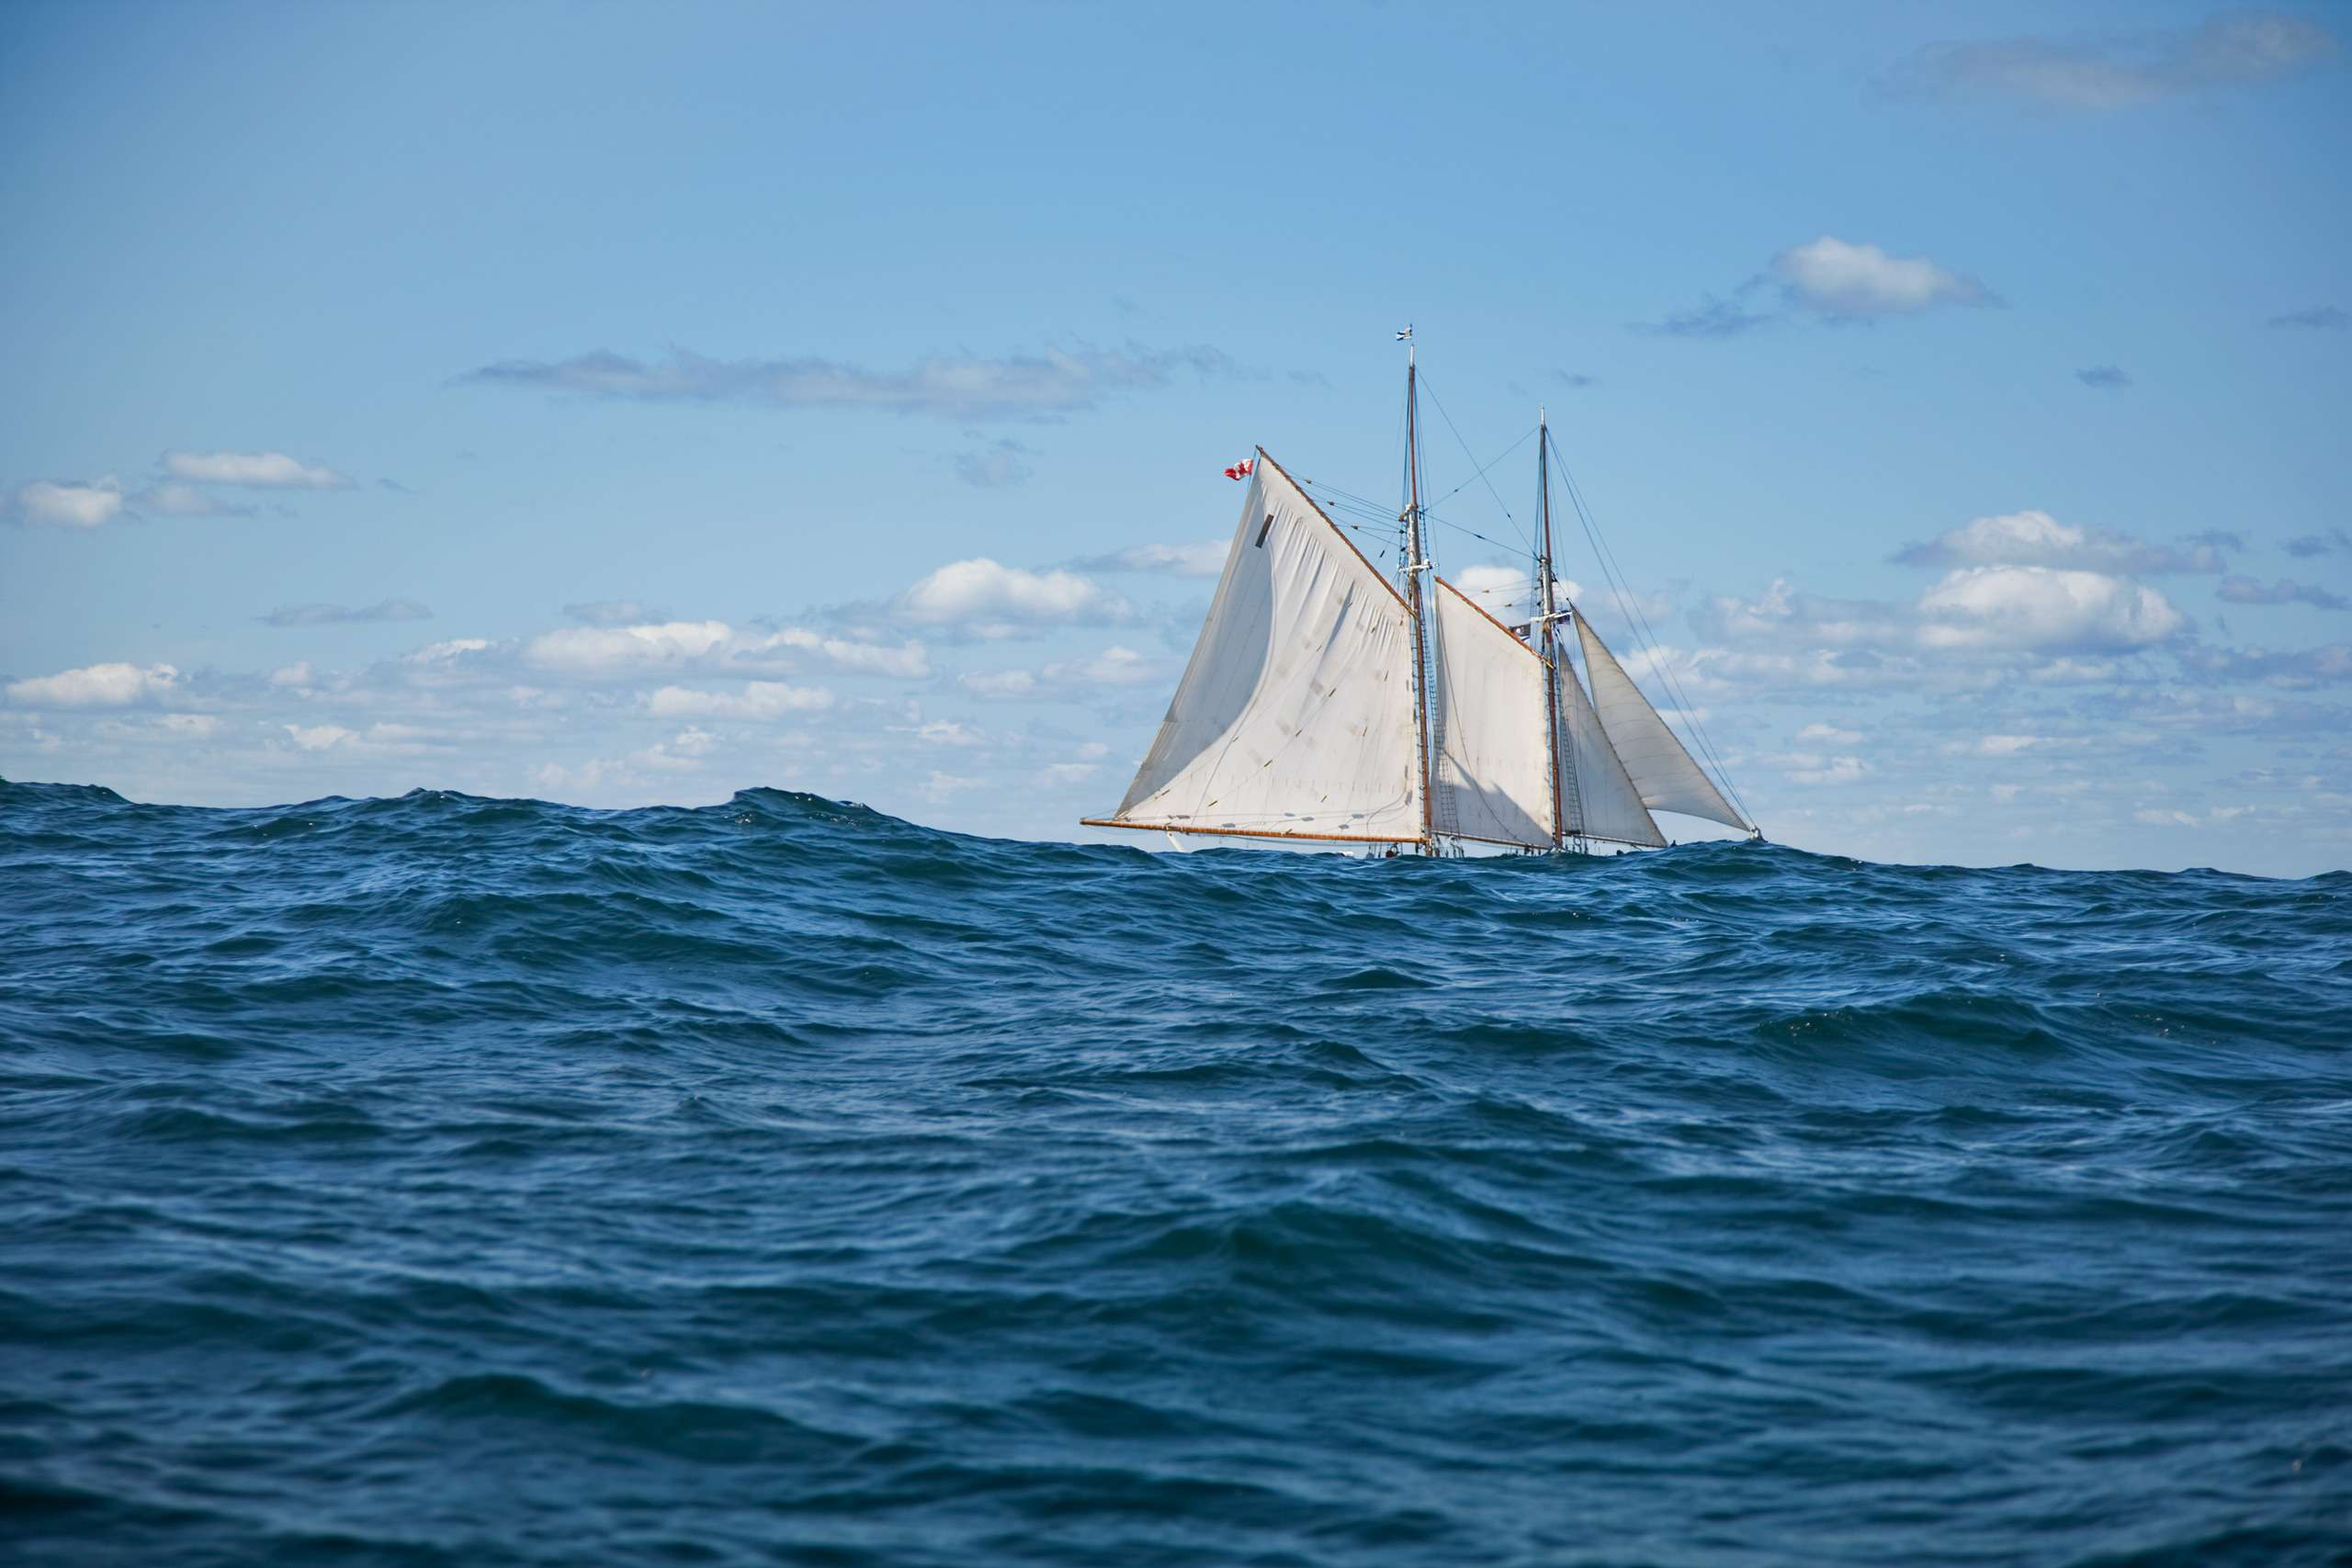 PORTFOLIO - Sailing - Windjammers #10   PCG463